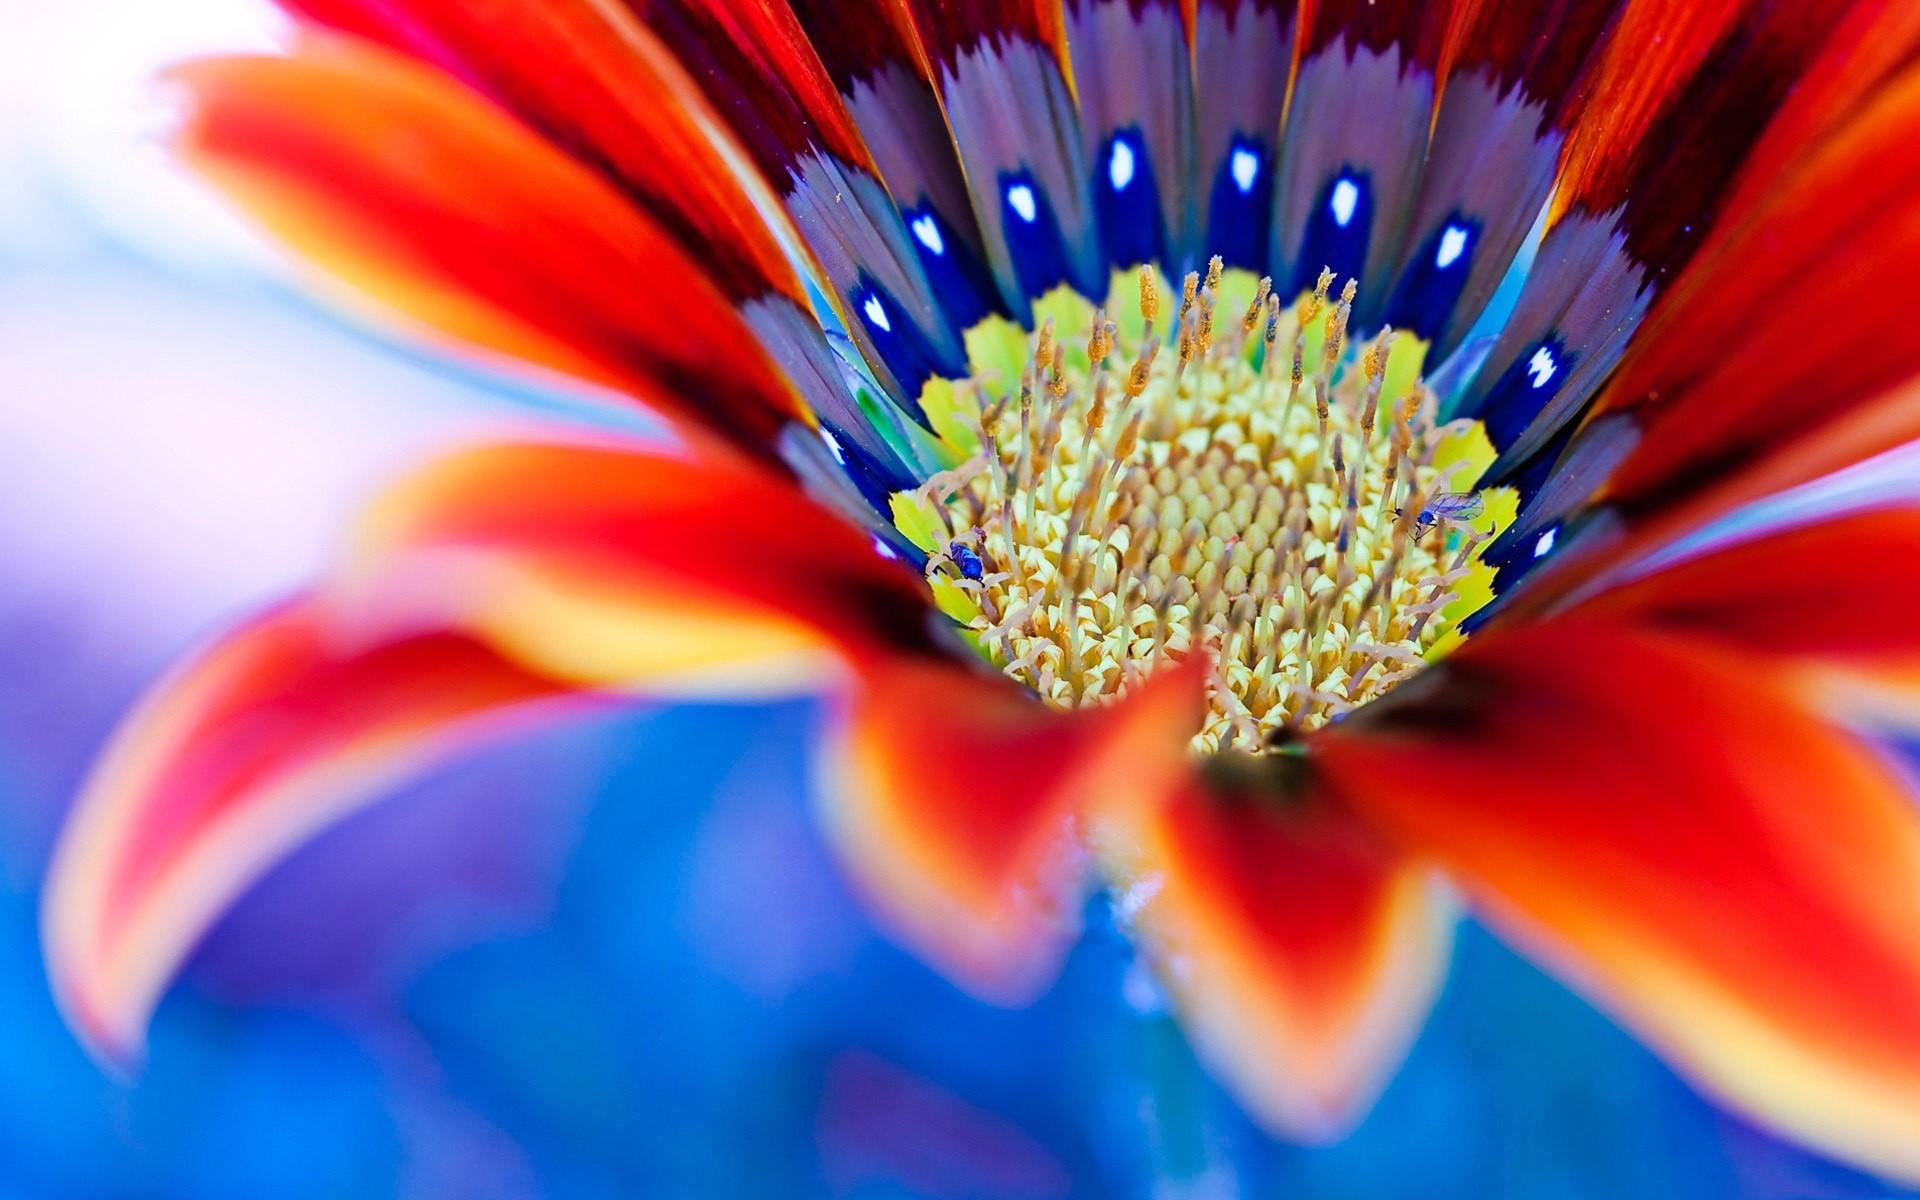 Wallpaper : sunlight, flowers, plants, yellow, blue, pollen, color ...